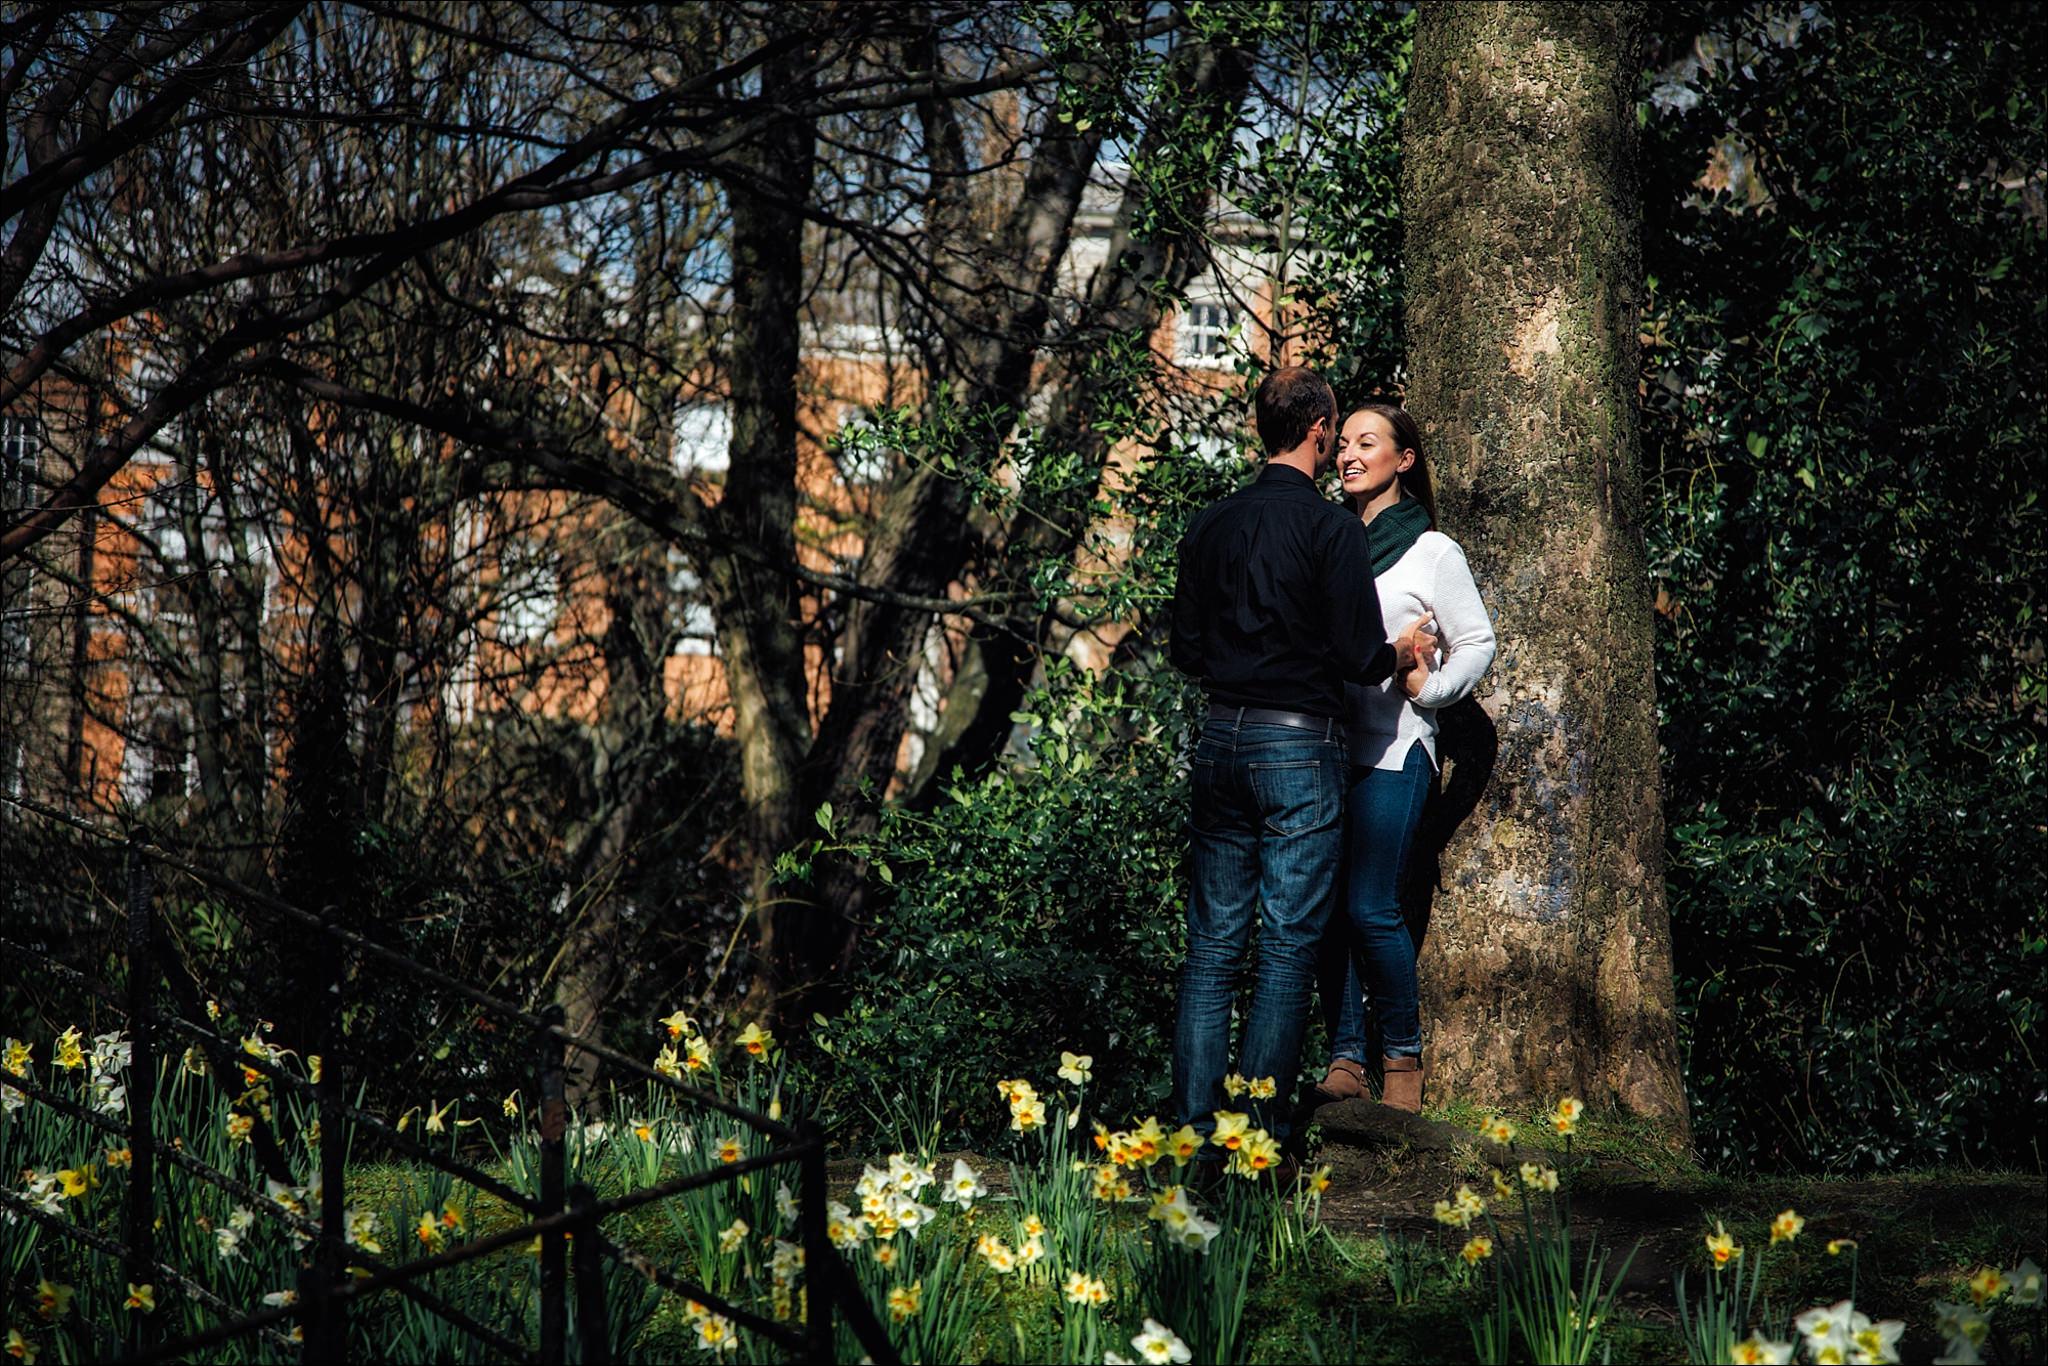 dublin wedding photographer david duignan photography engagement couple city photo shoot  ireland 0002